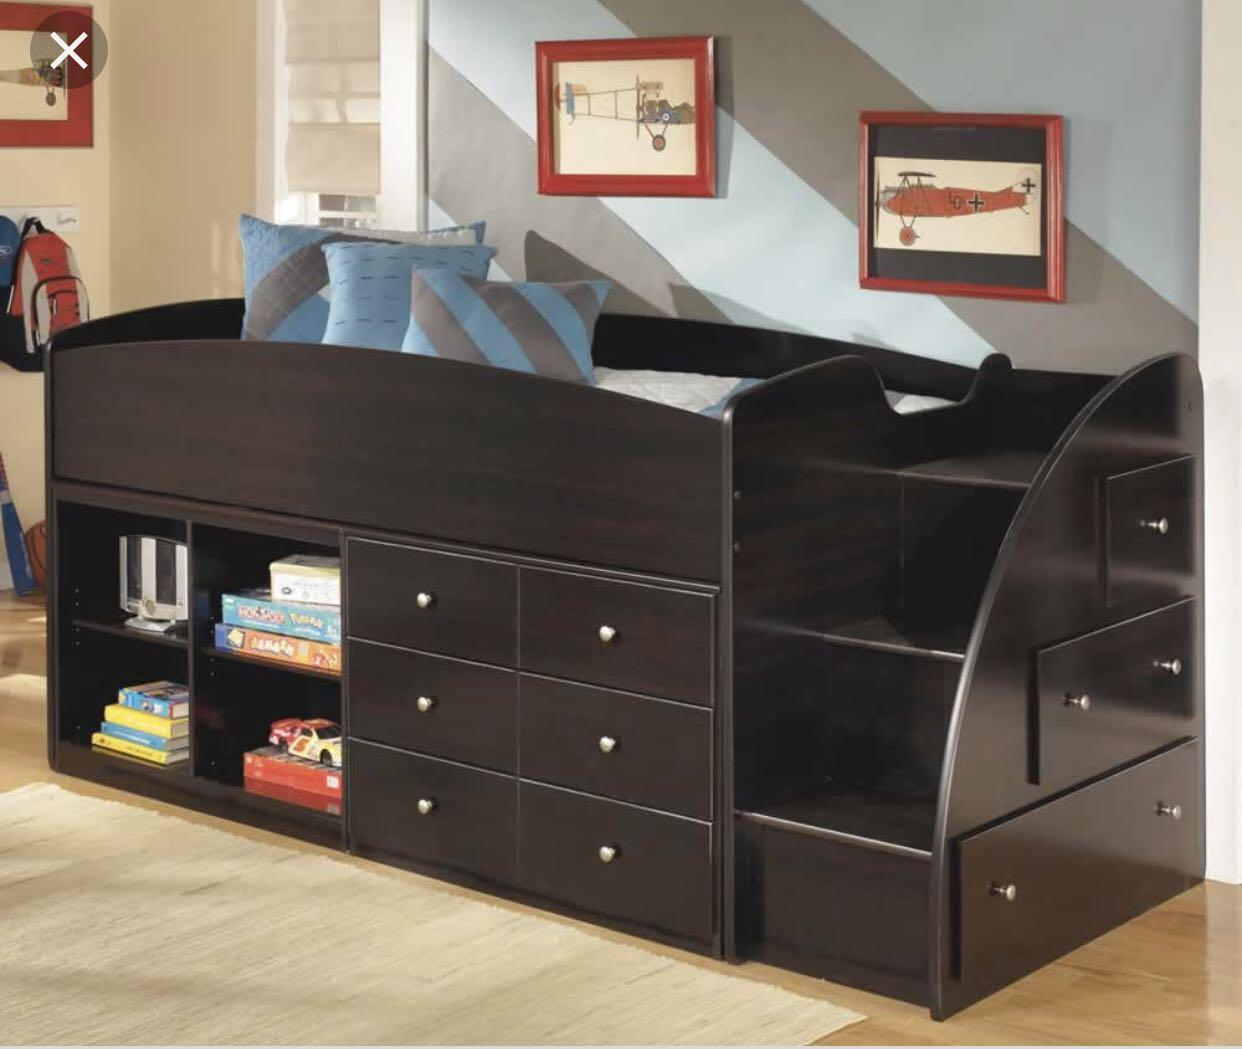 Twin loft bed with mattress and dresser set